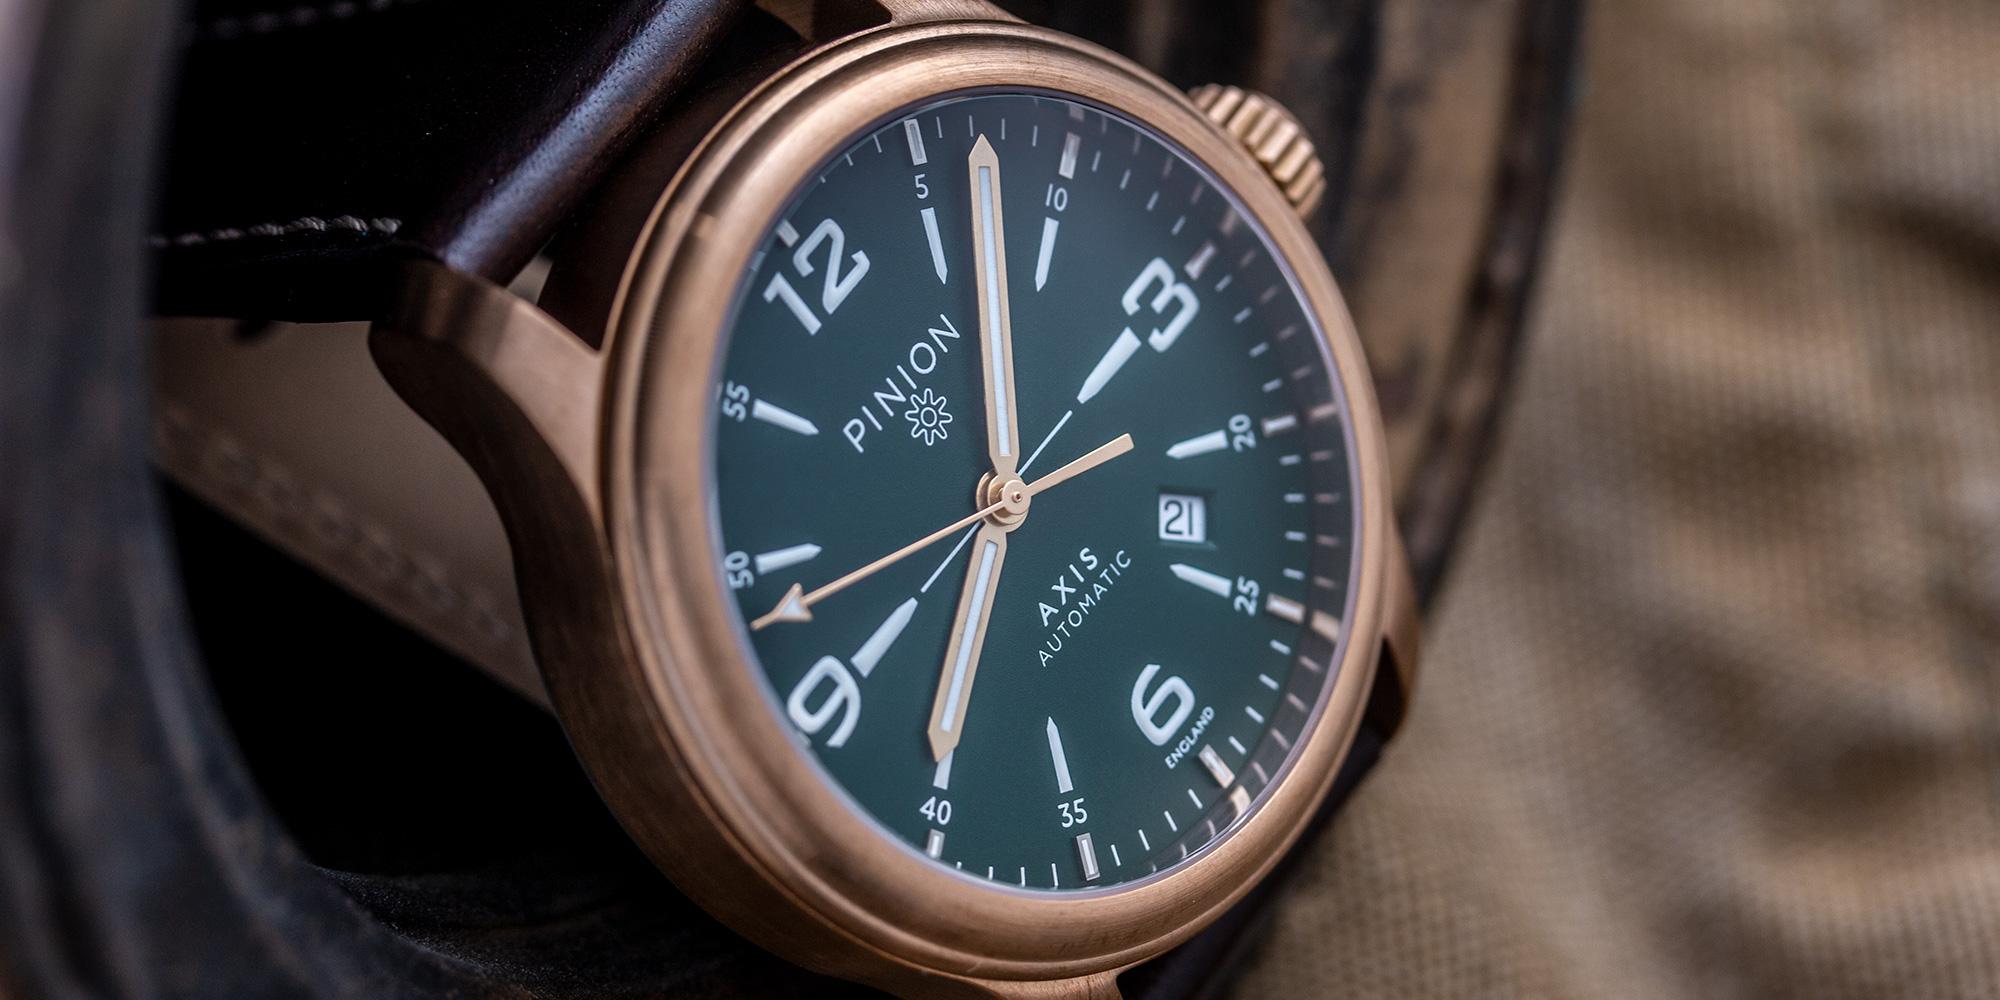 pinion-axis-ii-bronze-003